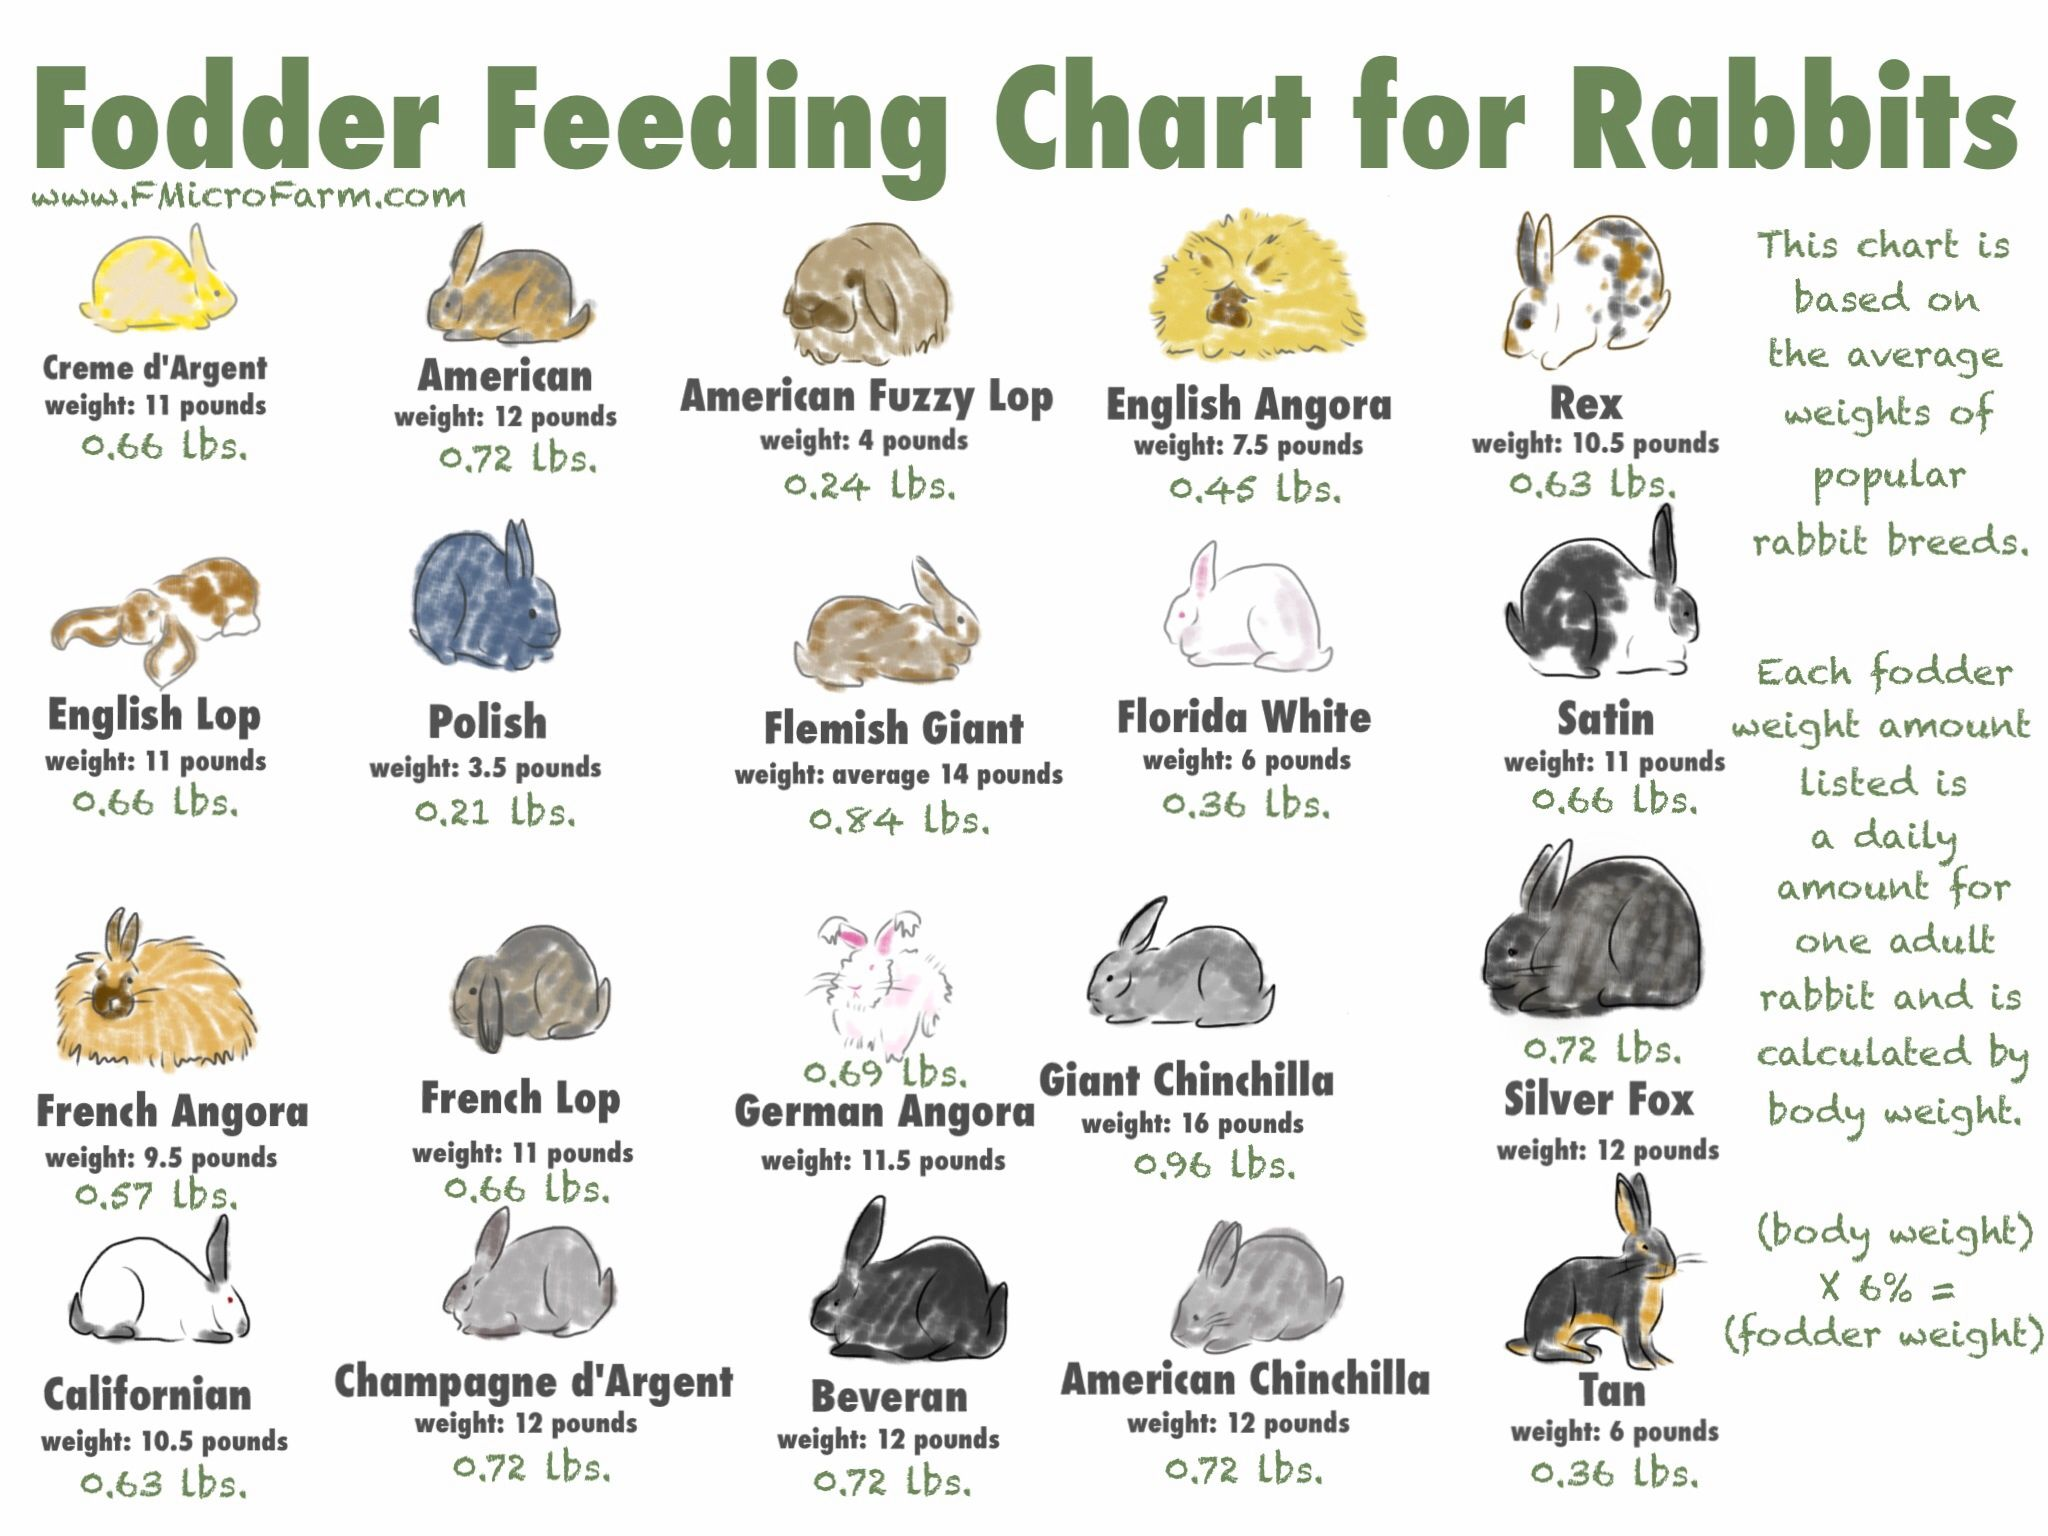 Fodder Feeding Chart For Rabbits Printable Rabbit Breeds